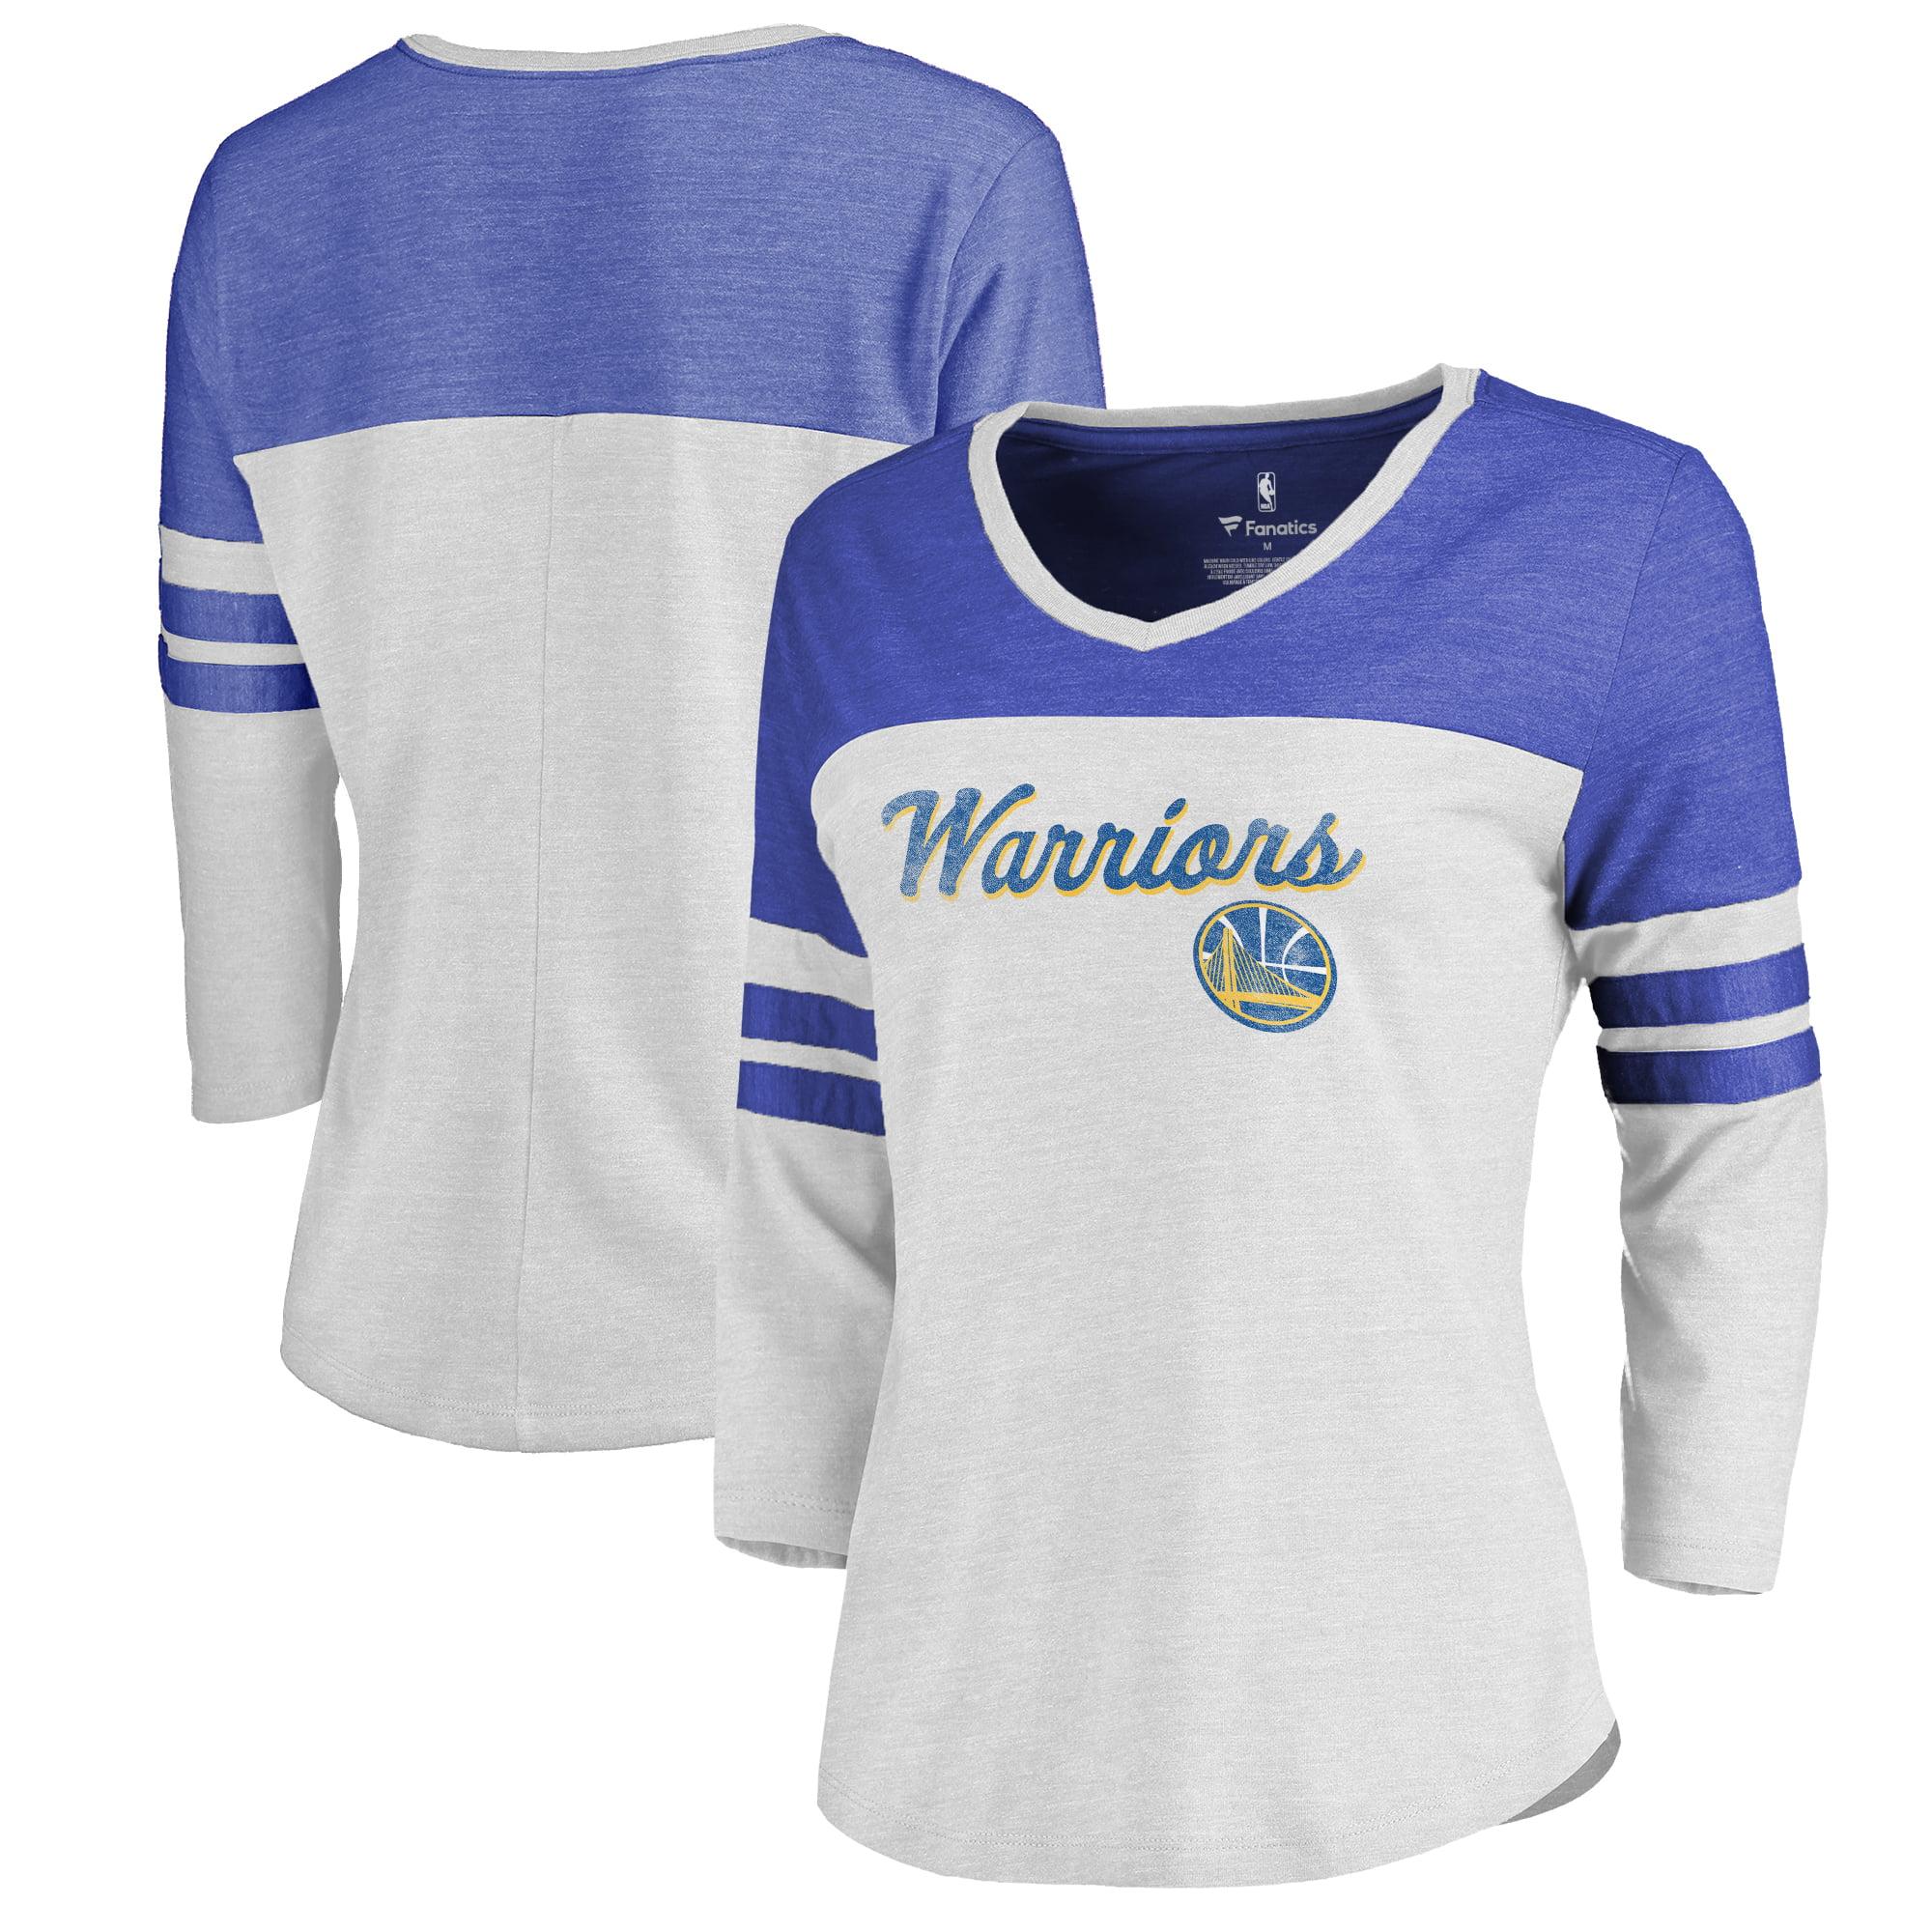 Golden State Warriors Fanatics Branded Women's Rising Script Plus Size Color Block 3/4 Sleeve Tri-Blend T-Shirt - White